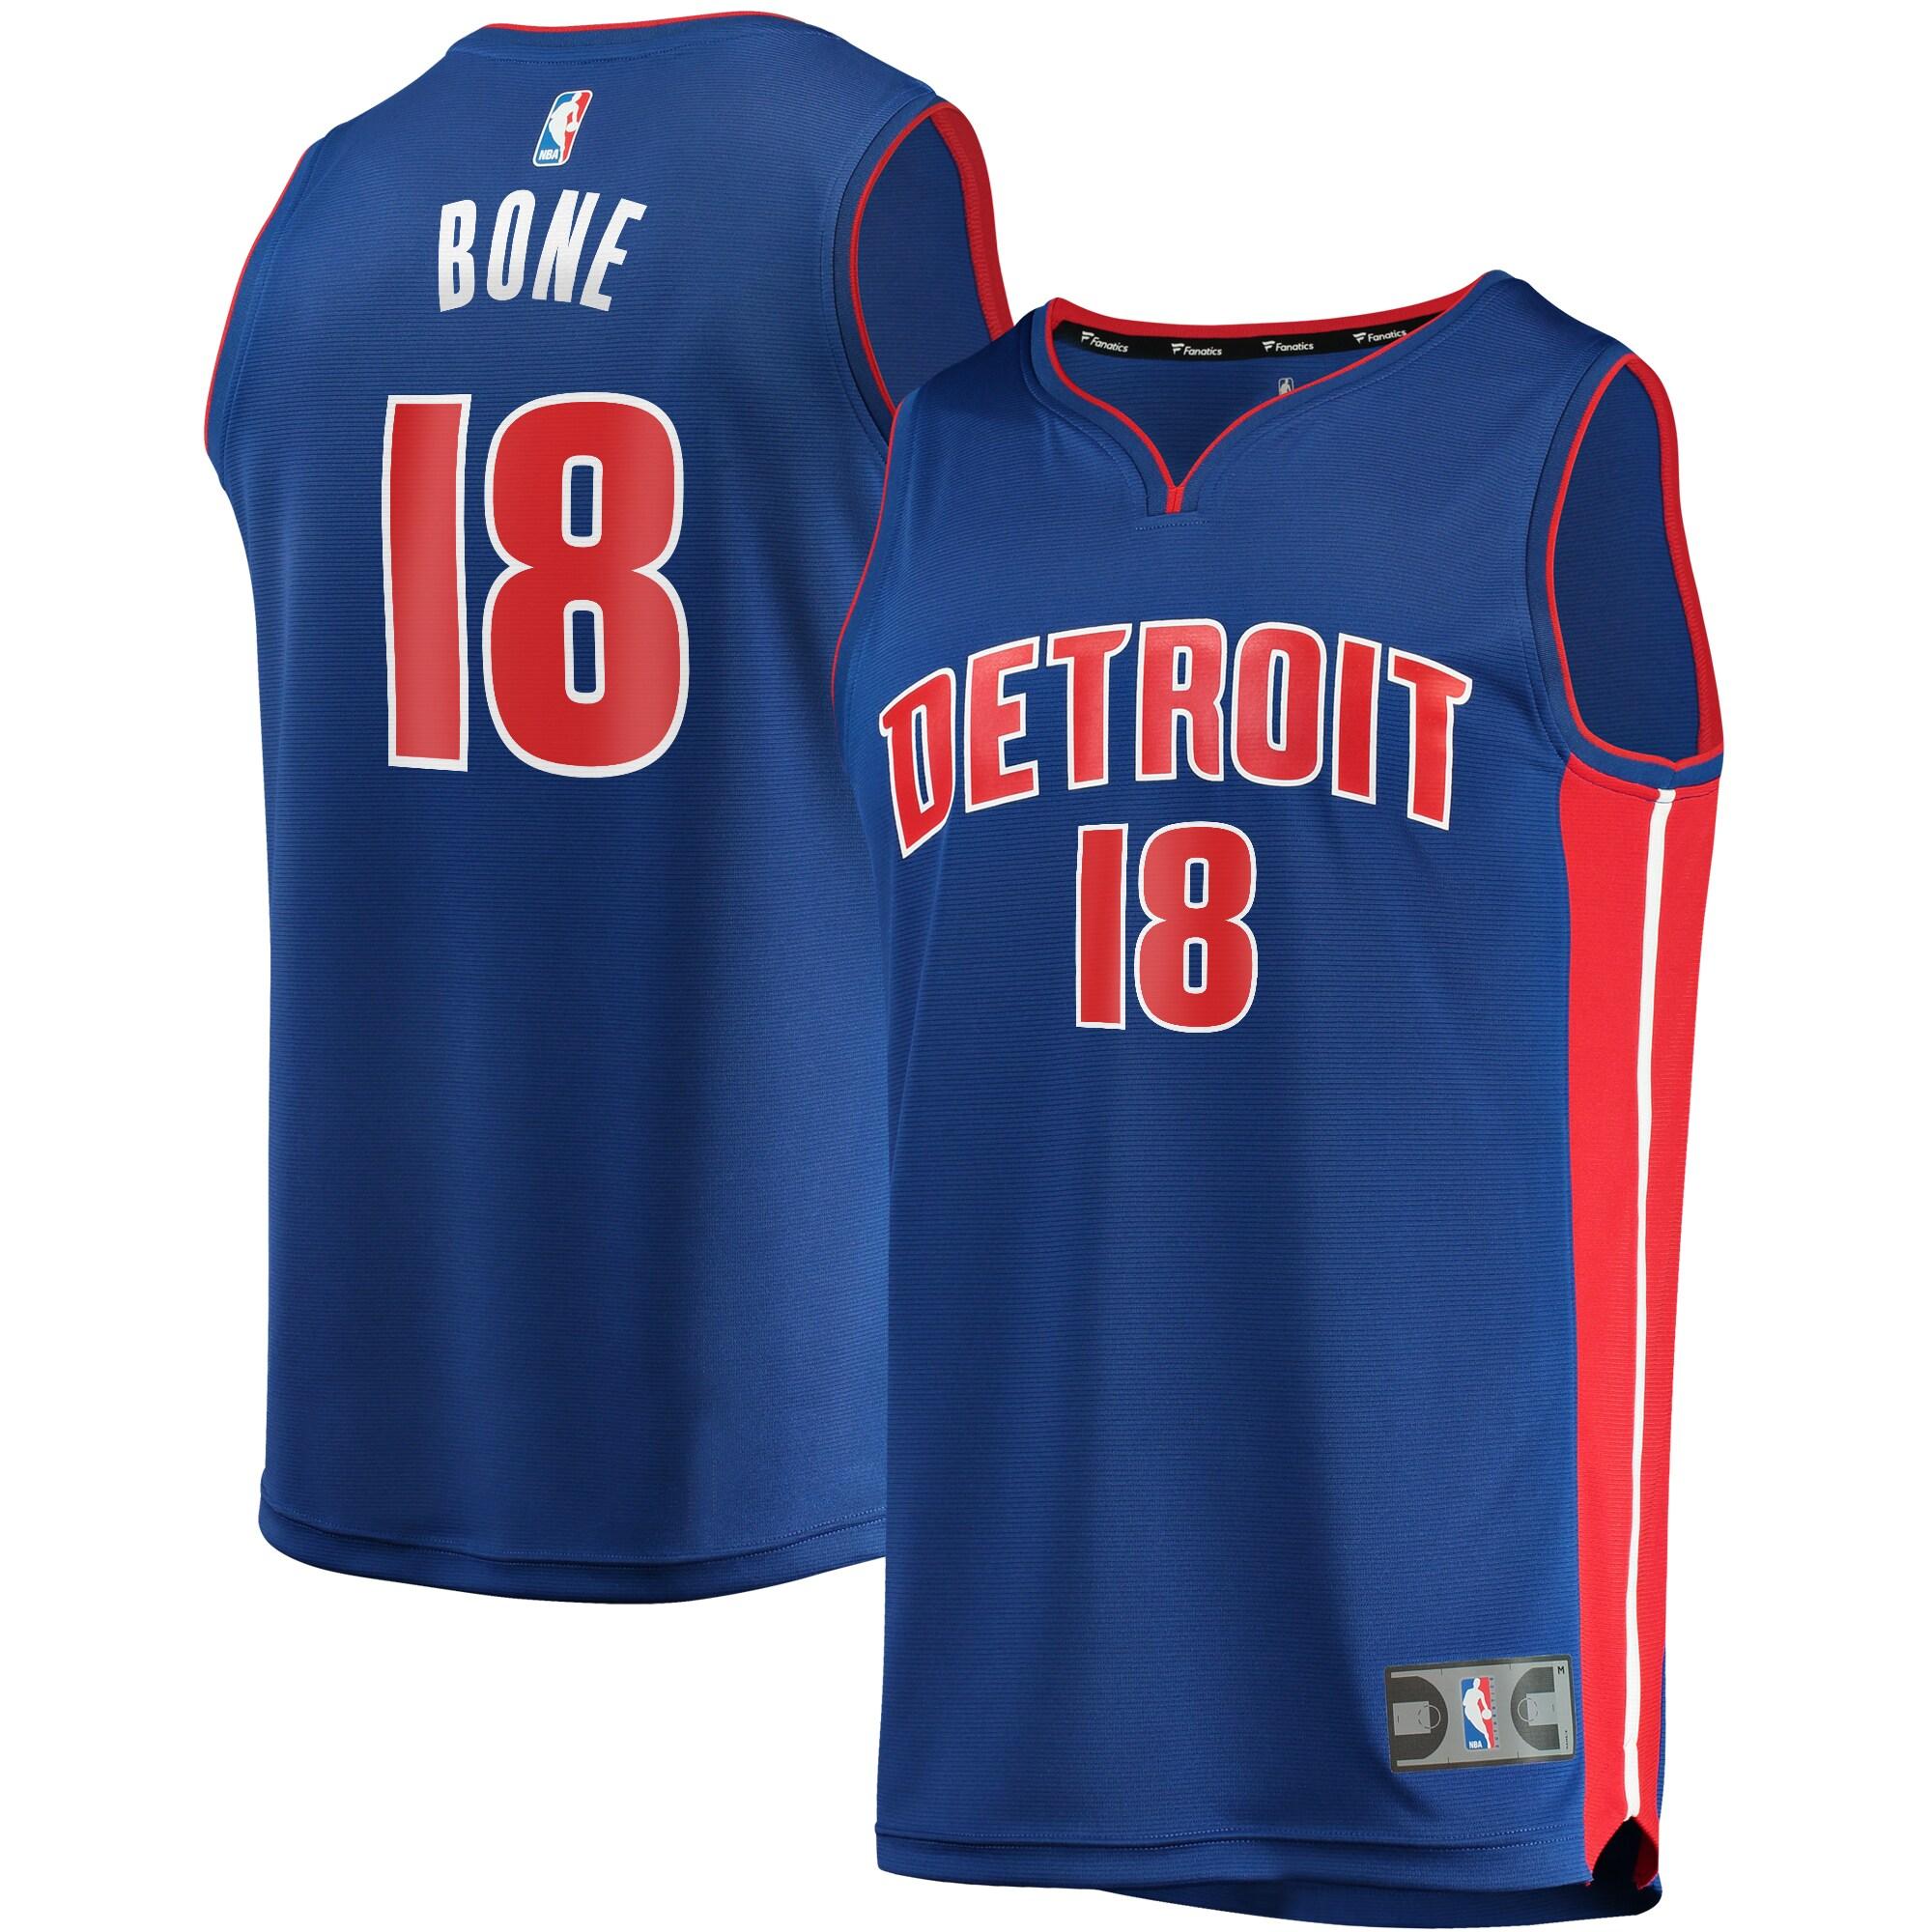 Jordan Bone Detroit Pistons Fanatics Branded Fast Break Replica Player Team Jersey - Icon Edition - Blue